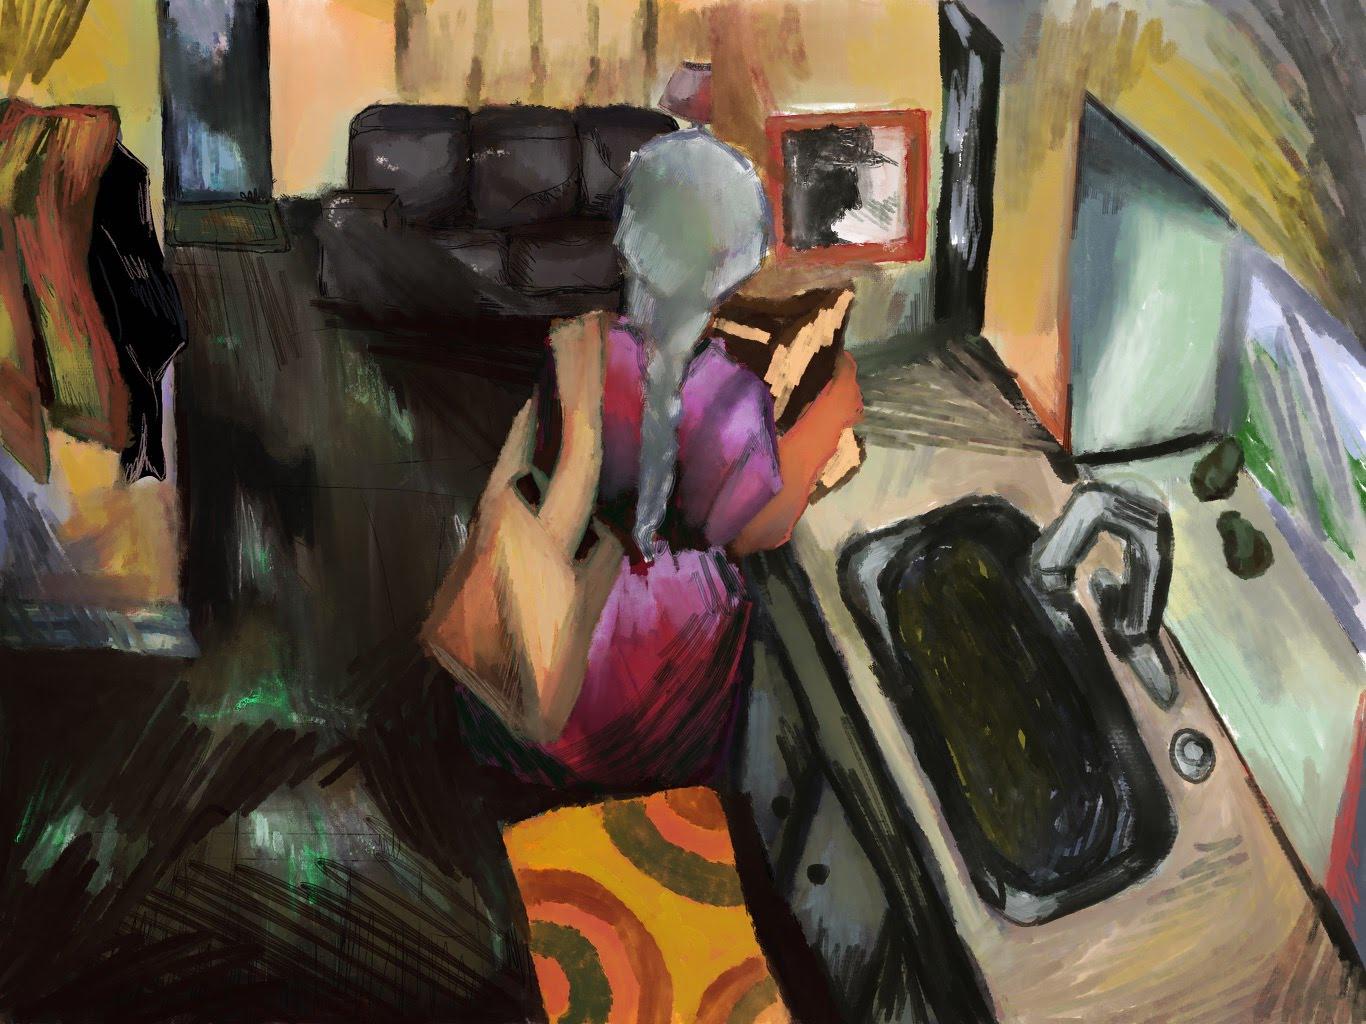 Angelica Esquivel Wins Zócalo's 10th Annual Poetry Prize | Zocalo Public Square • Arizona State University • Smithsonian